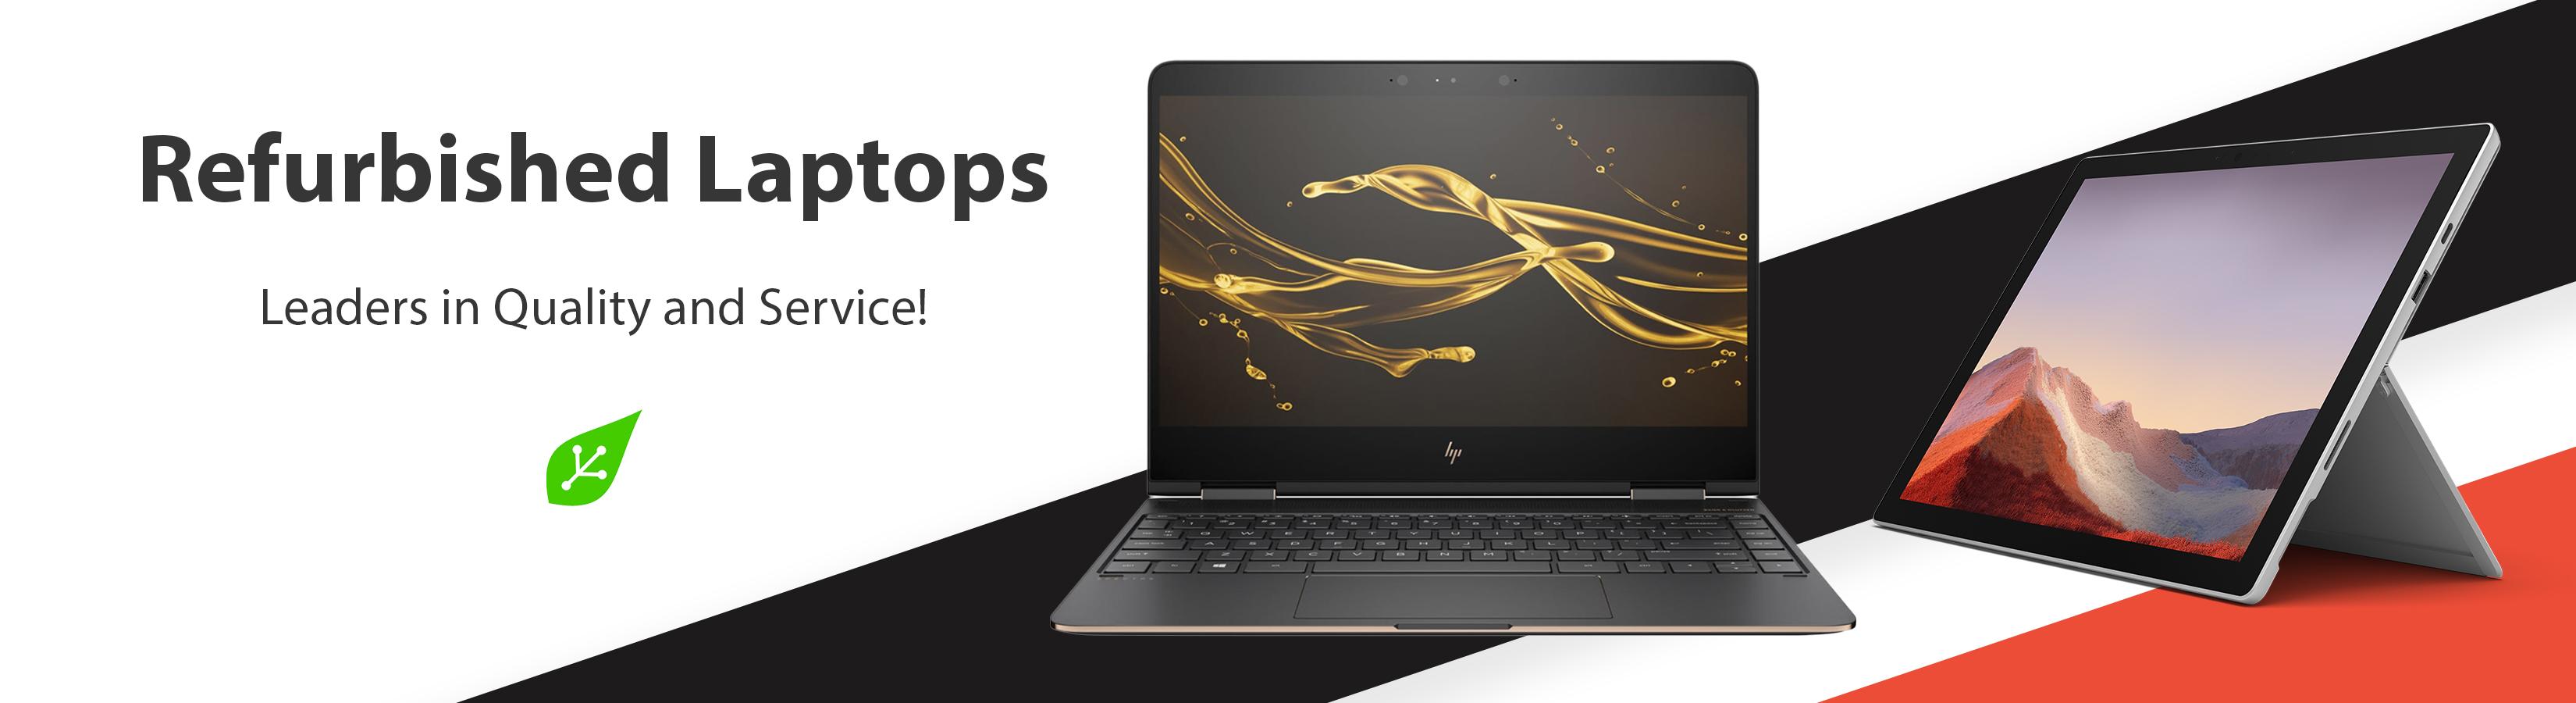 Refurbished Laptops | Recompute